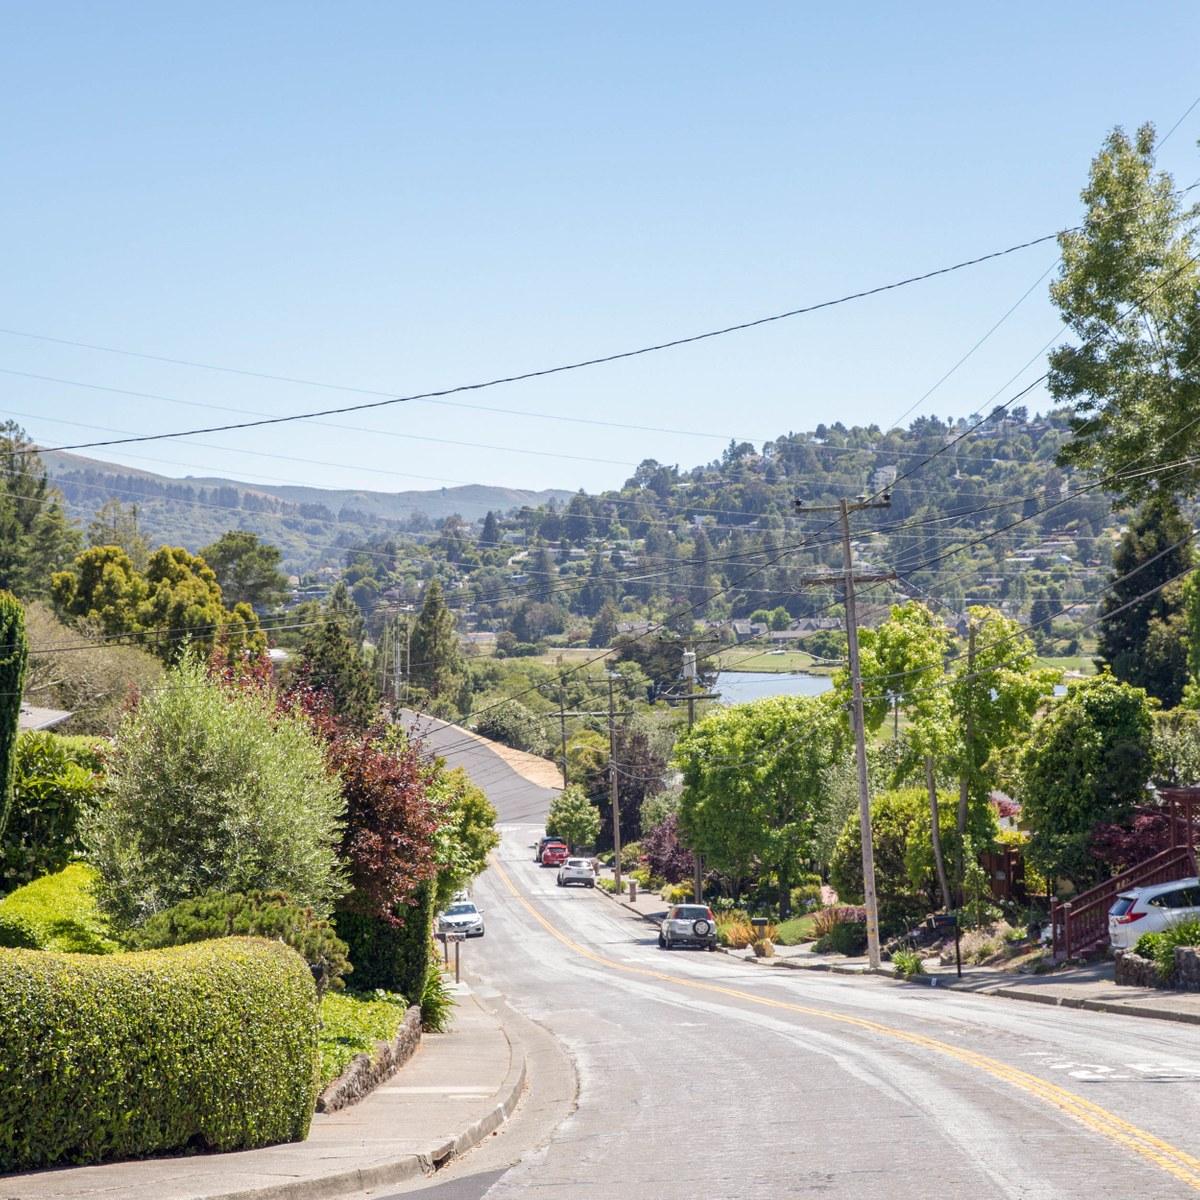 Vs Hunting Ridge Apartments: Bayfront/Enchanted Knolls/Shelter Ridge, Mill Valley CA